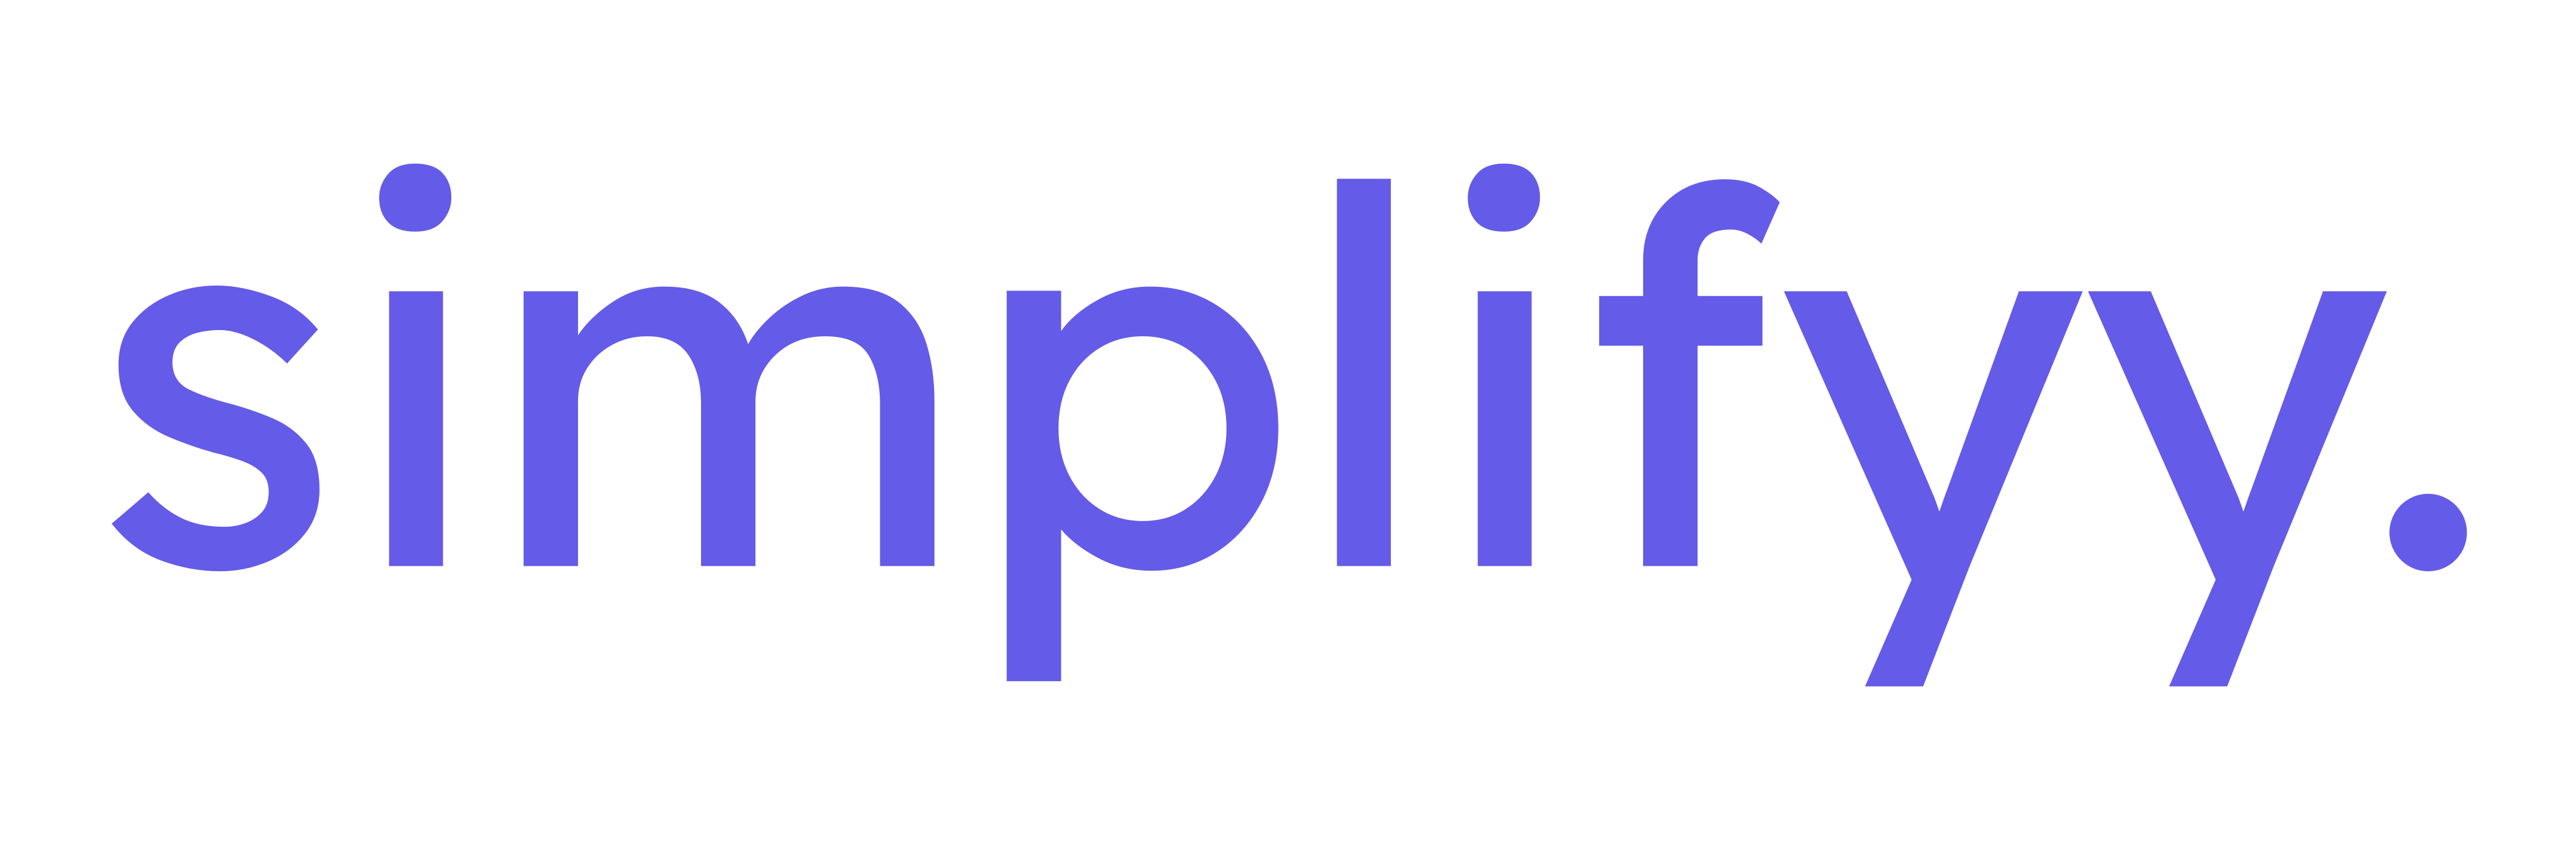 https://anysizedealsweek.com/wp-content/uploads/2020/07/Simplifyy-Logo-Purple.png